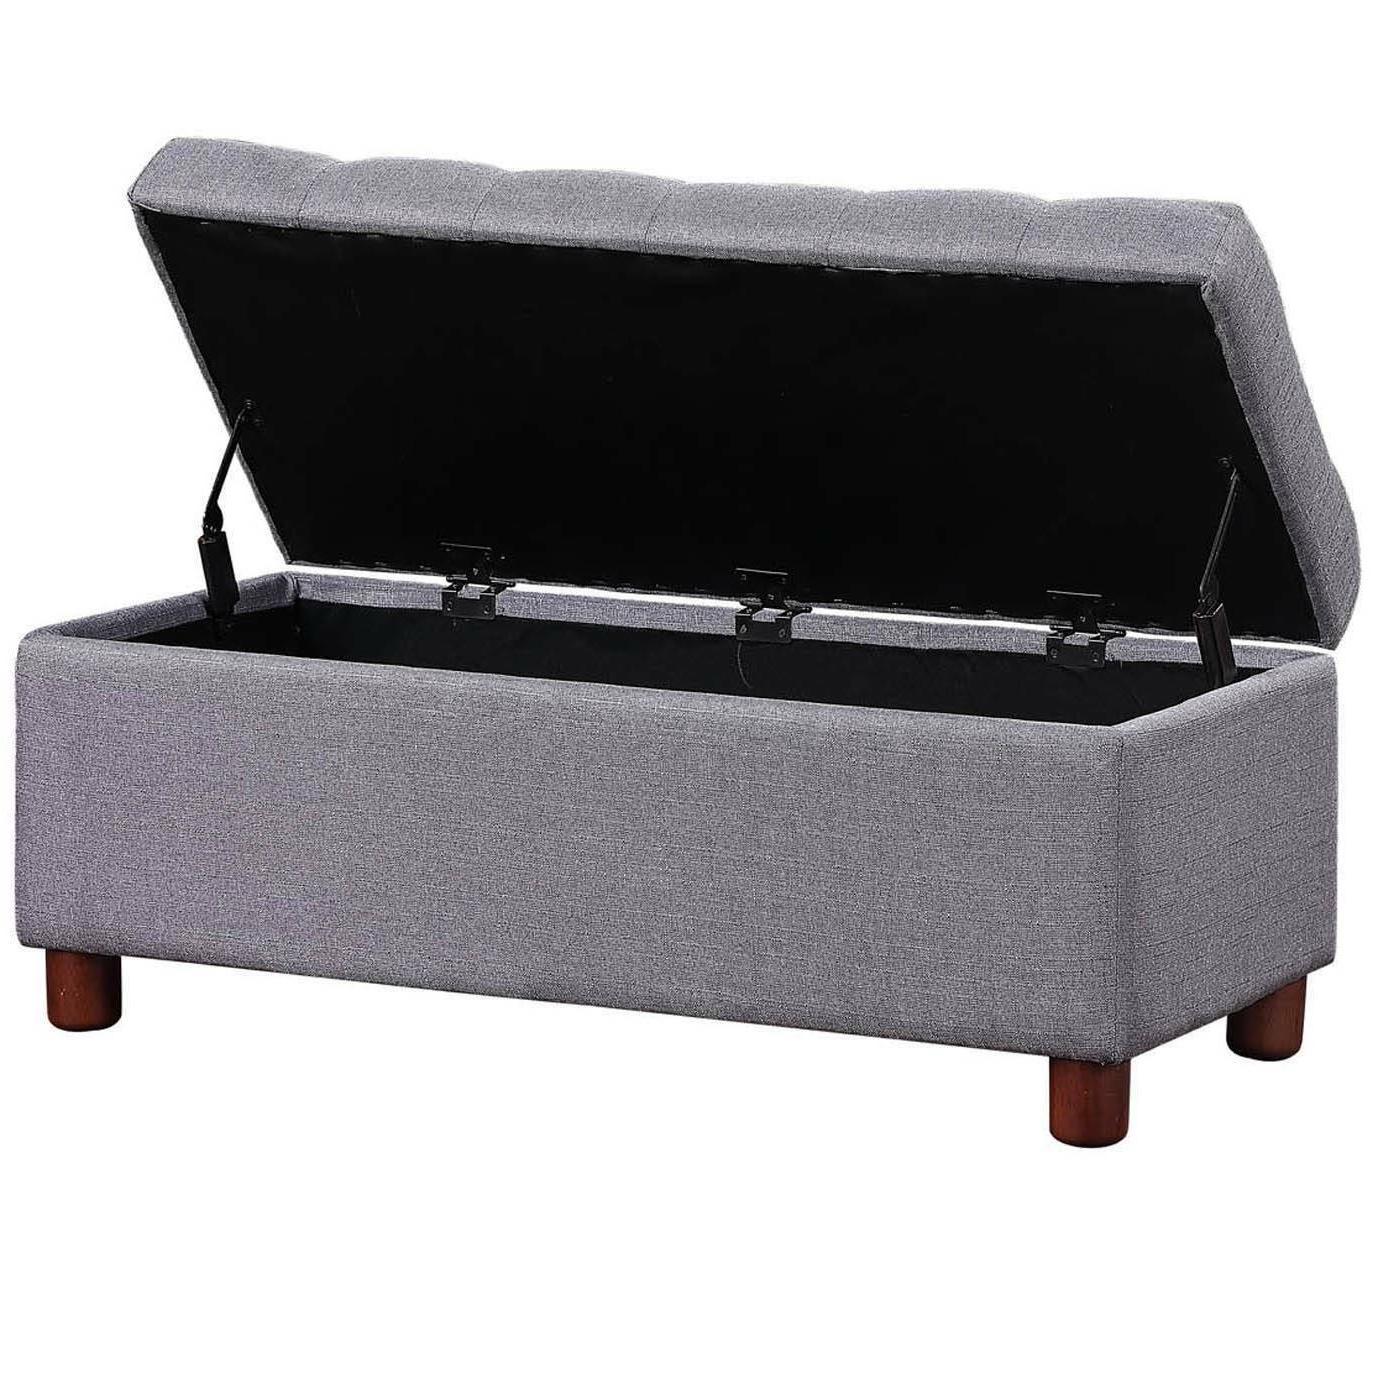 39'' Tufted Linen Fabric Storage Bench, Grey